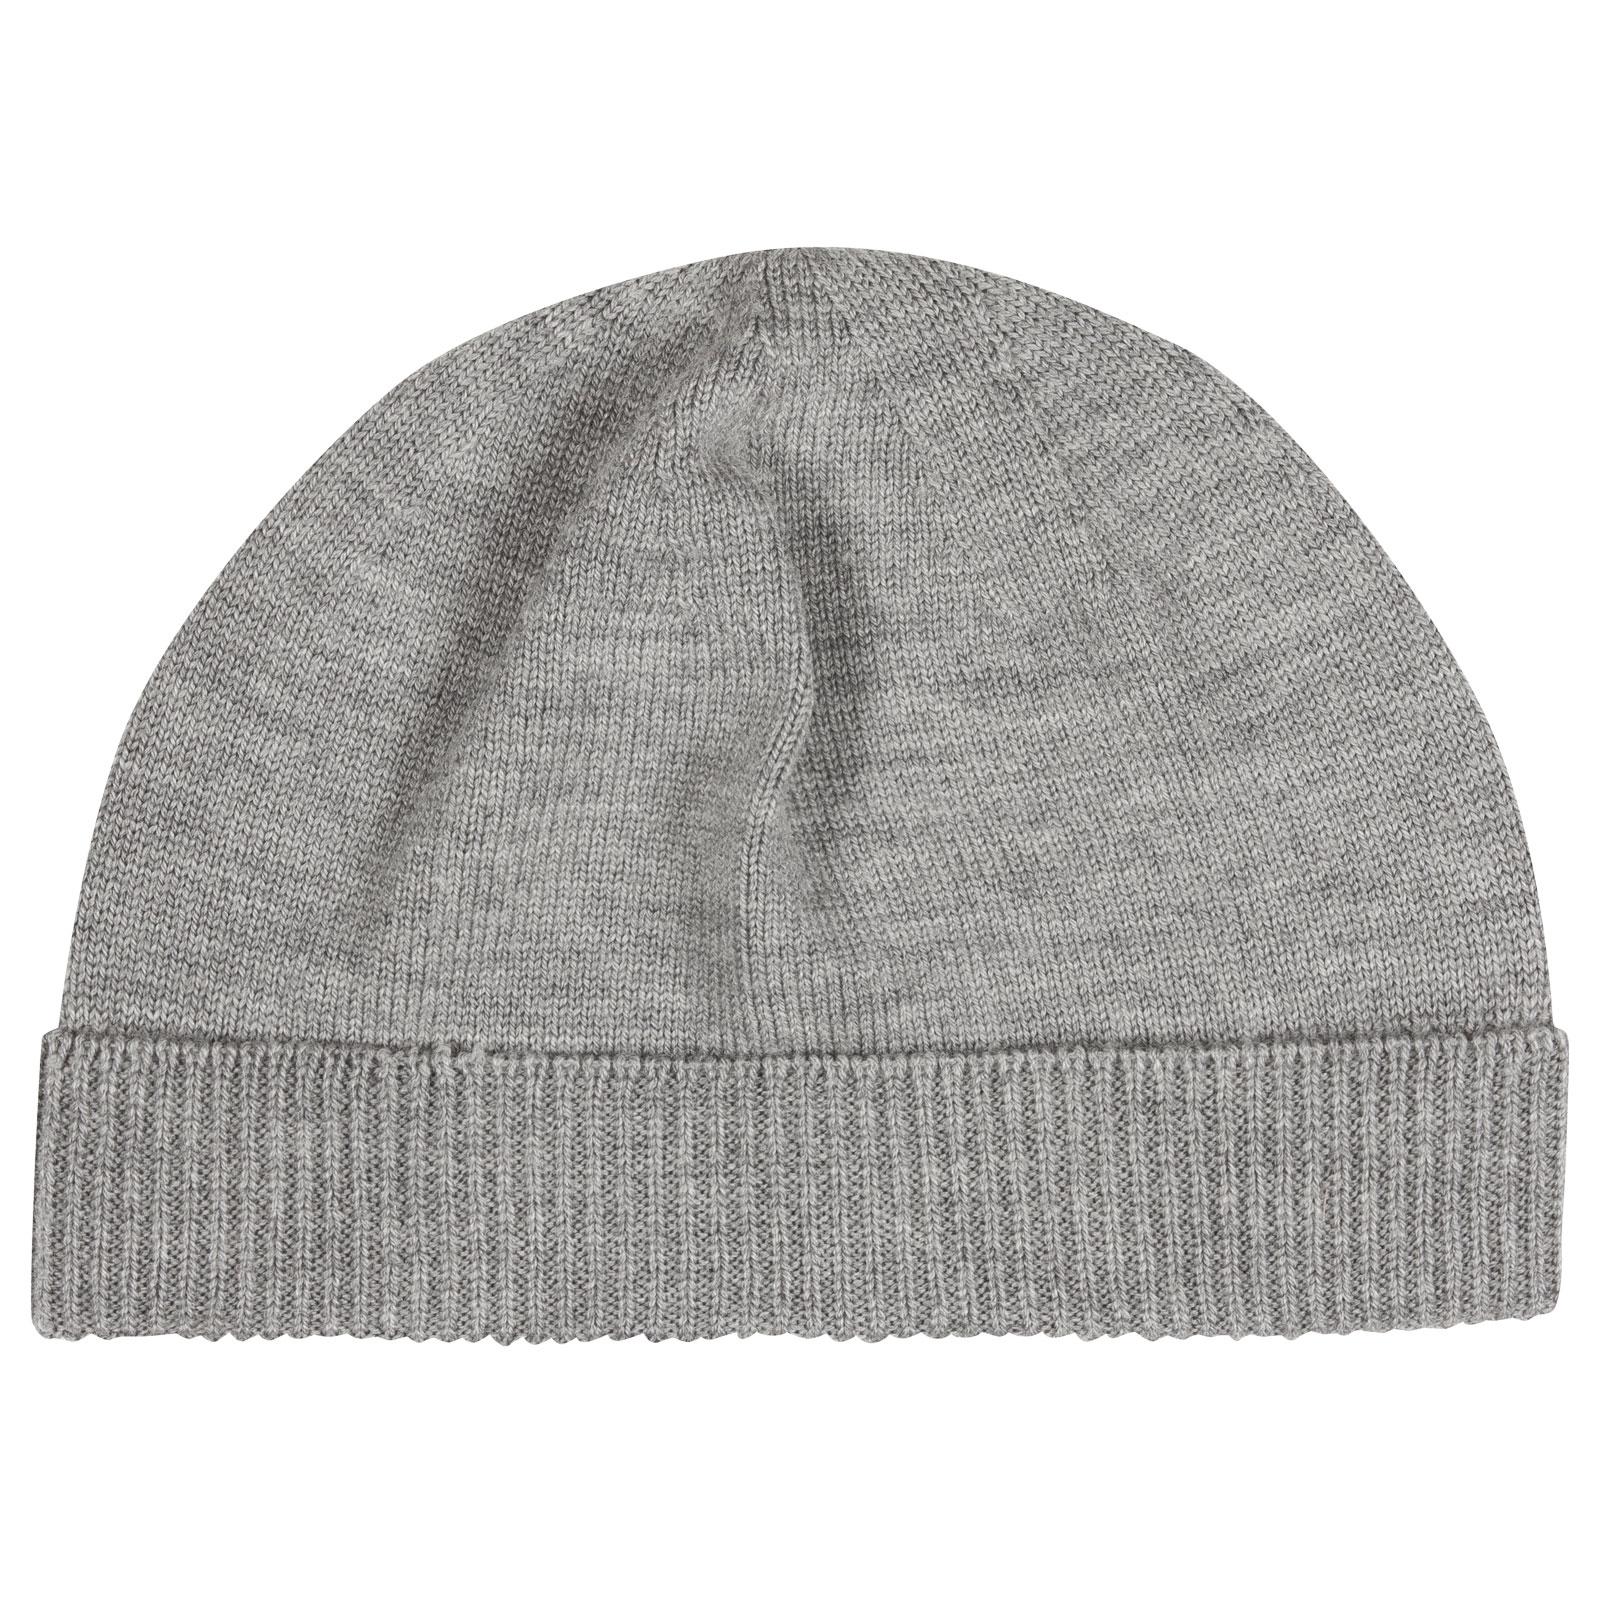 John Smedley Taurus Merino Wool Hat in Silver-ONE